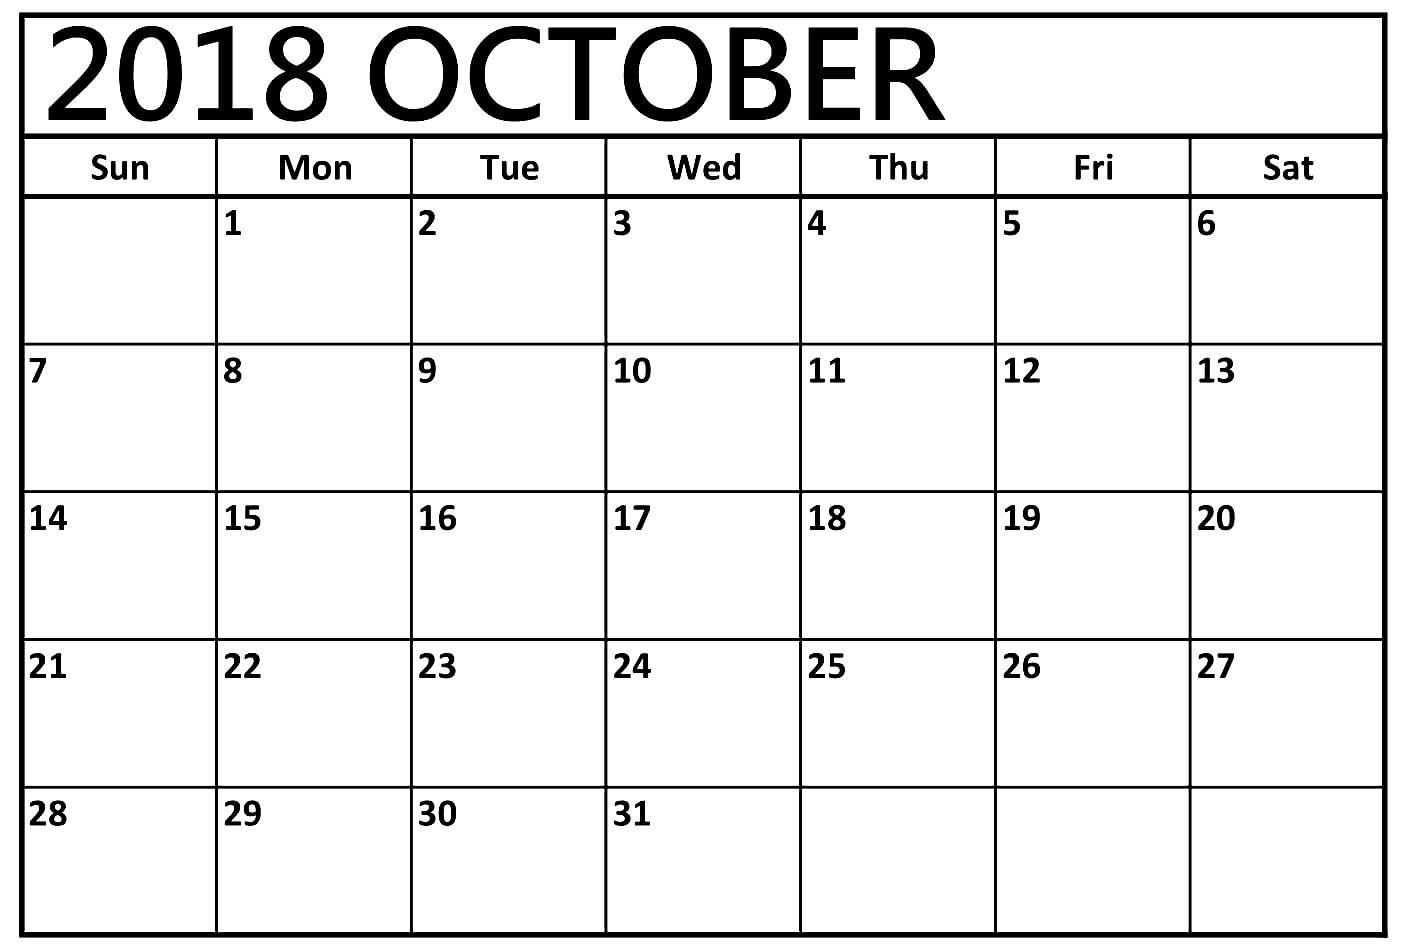 October 2018 Calendar Australia October 2018 Calendar Australia